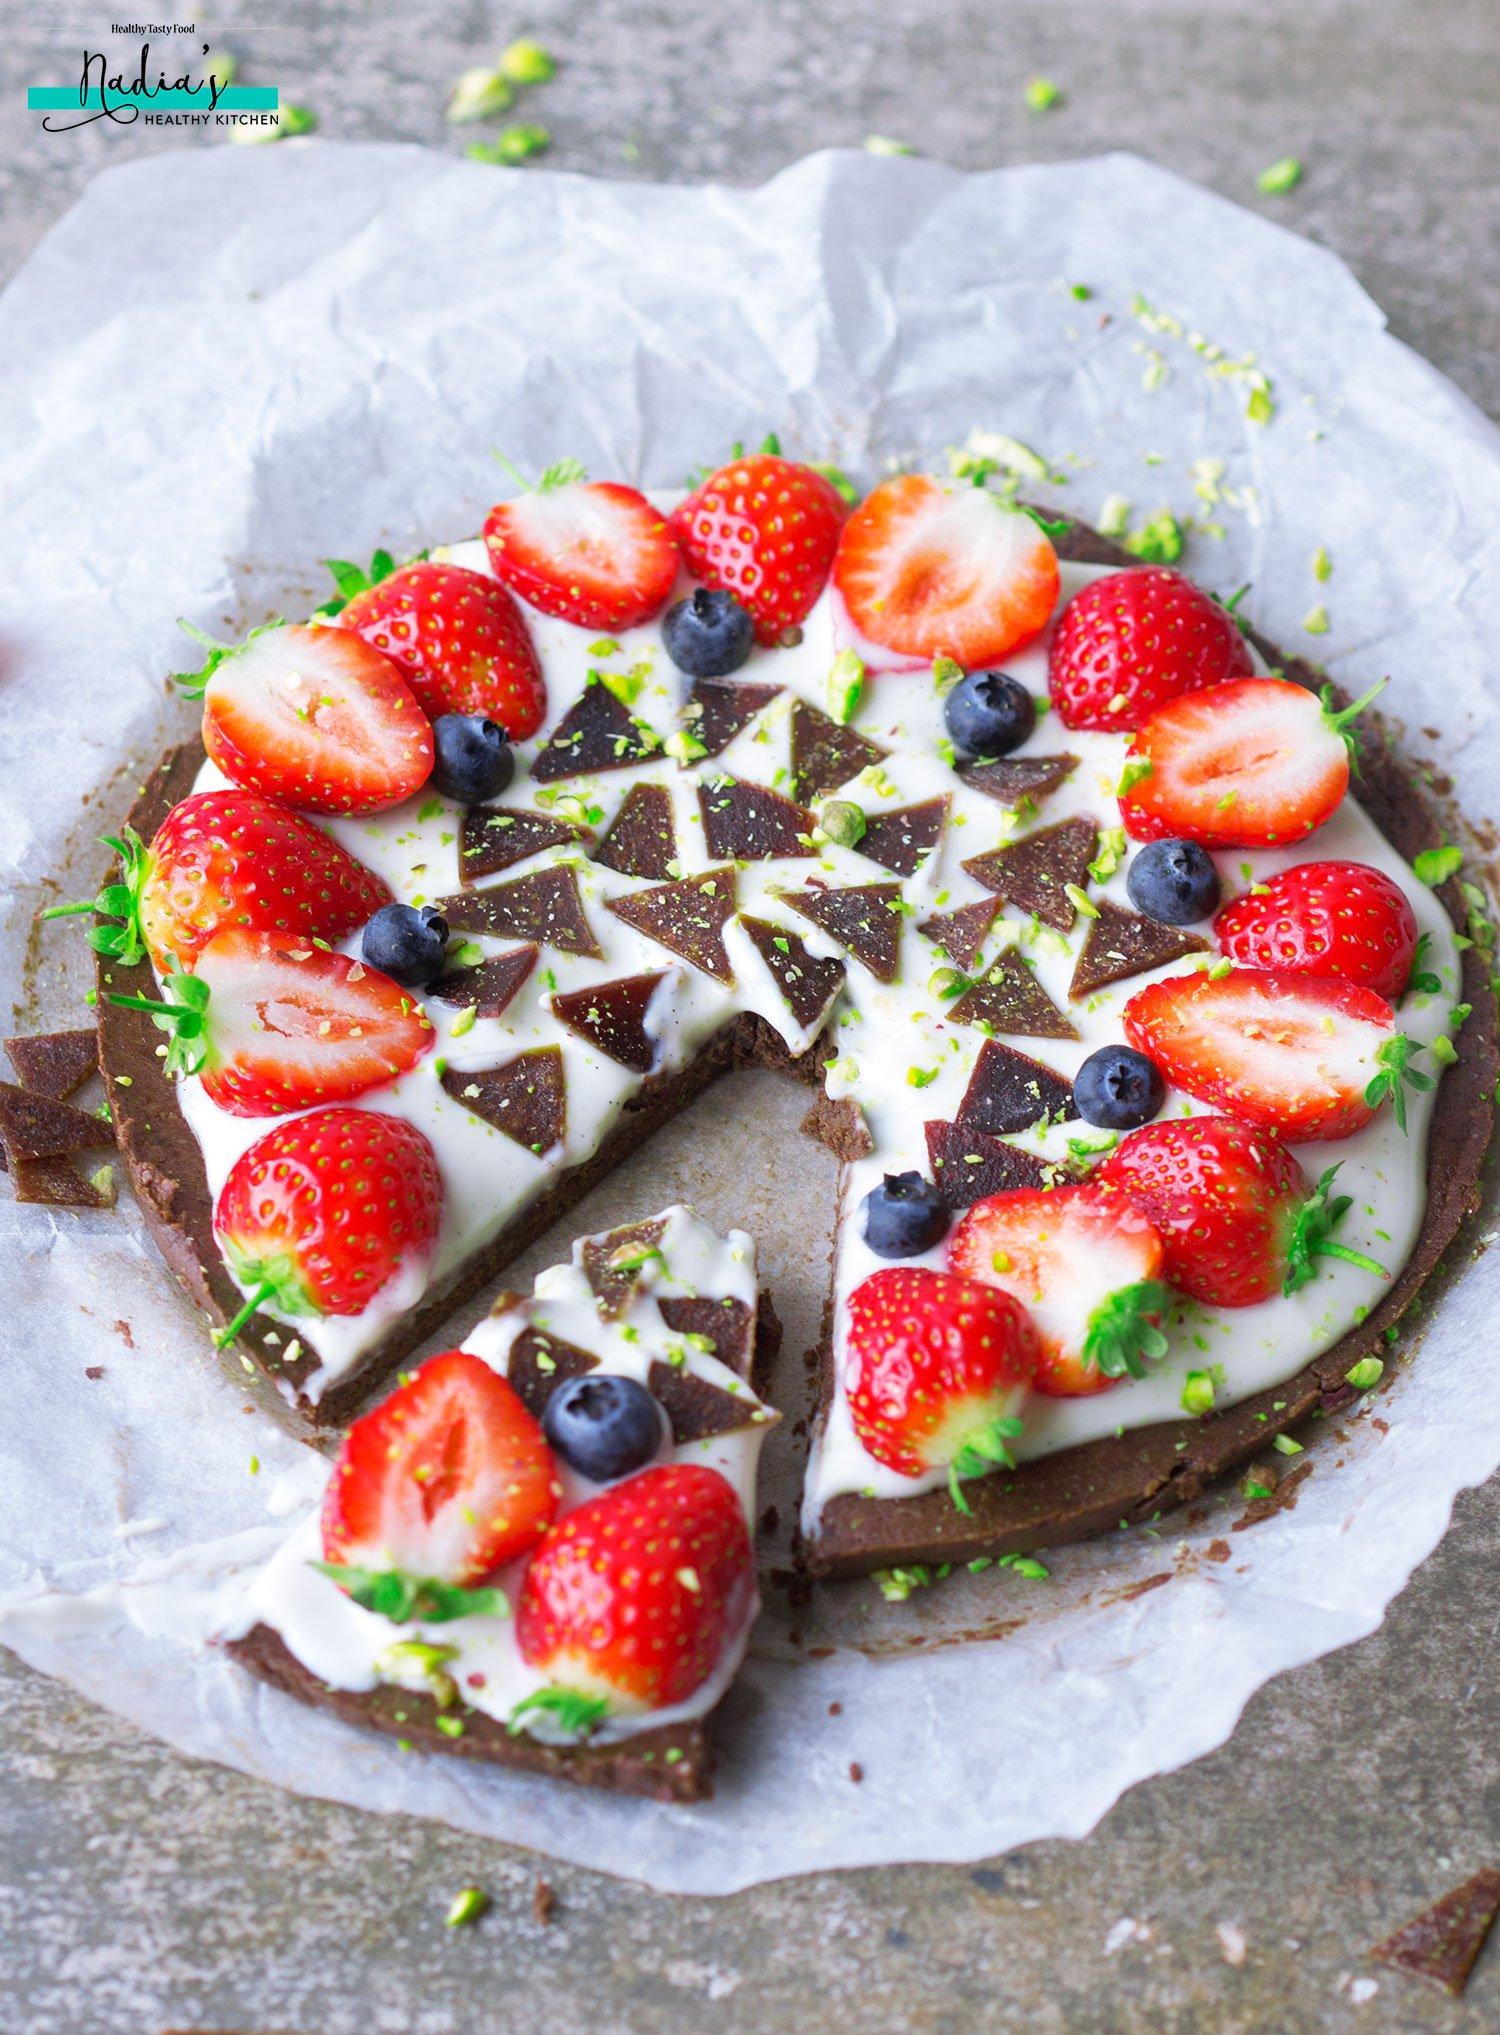 Breakfasts archives uk health blog nadia 39 s healthy kitchen - Dessert vegan sans gluten ...